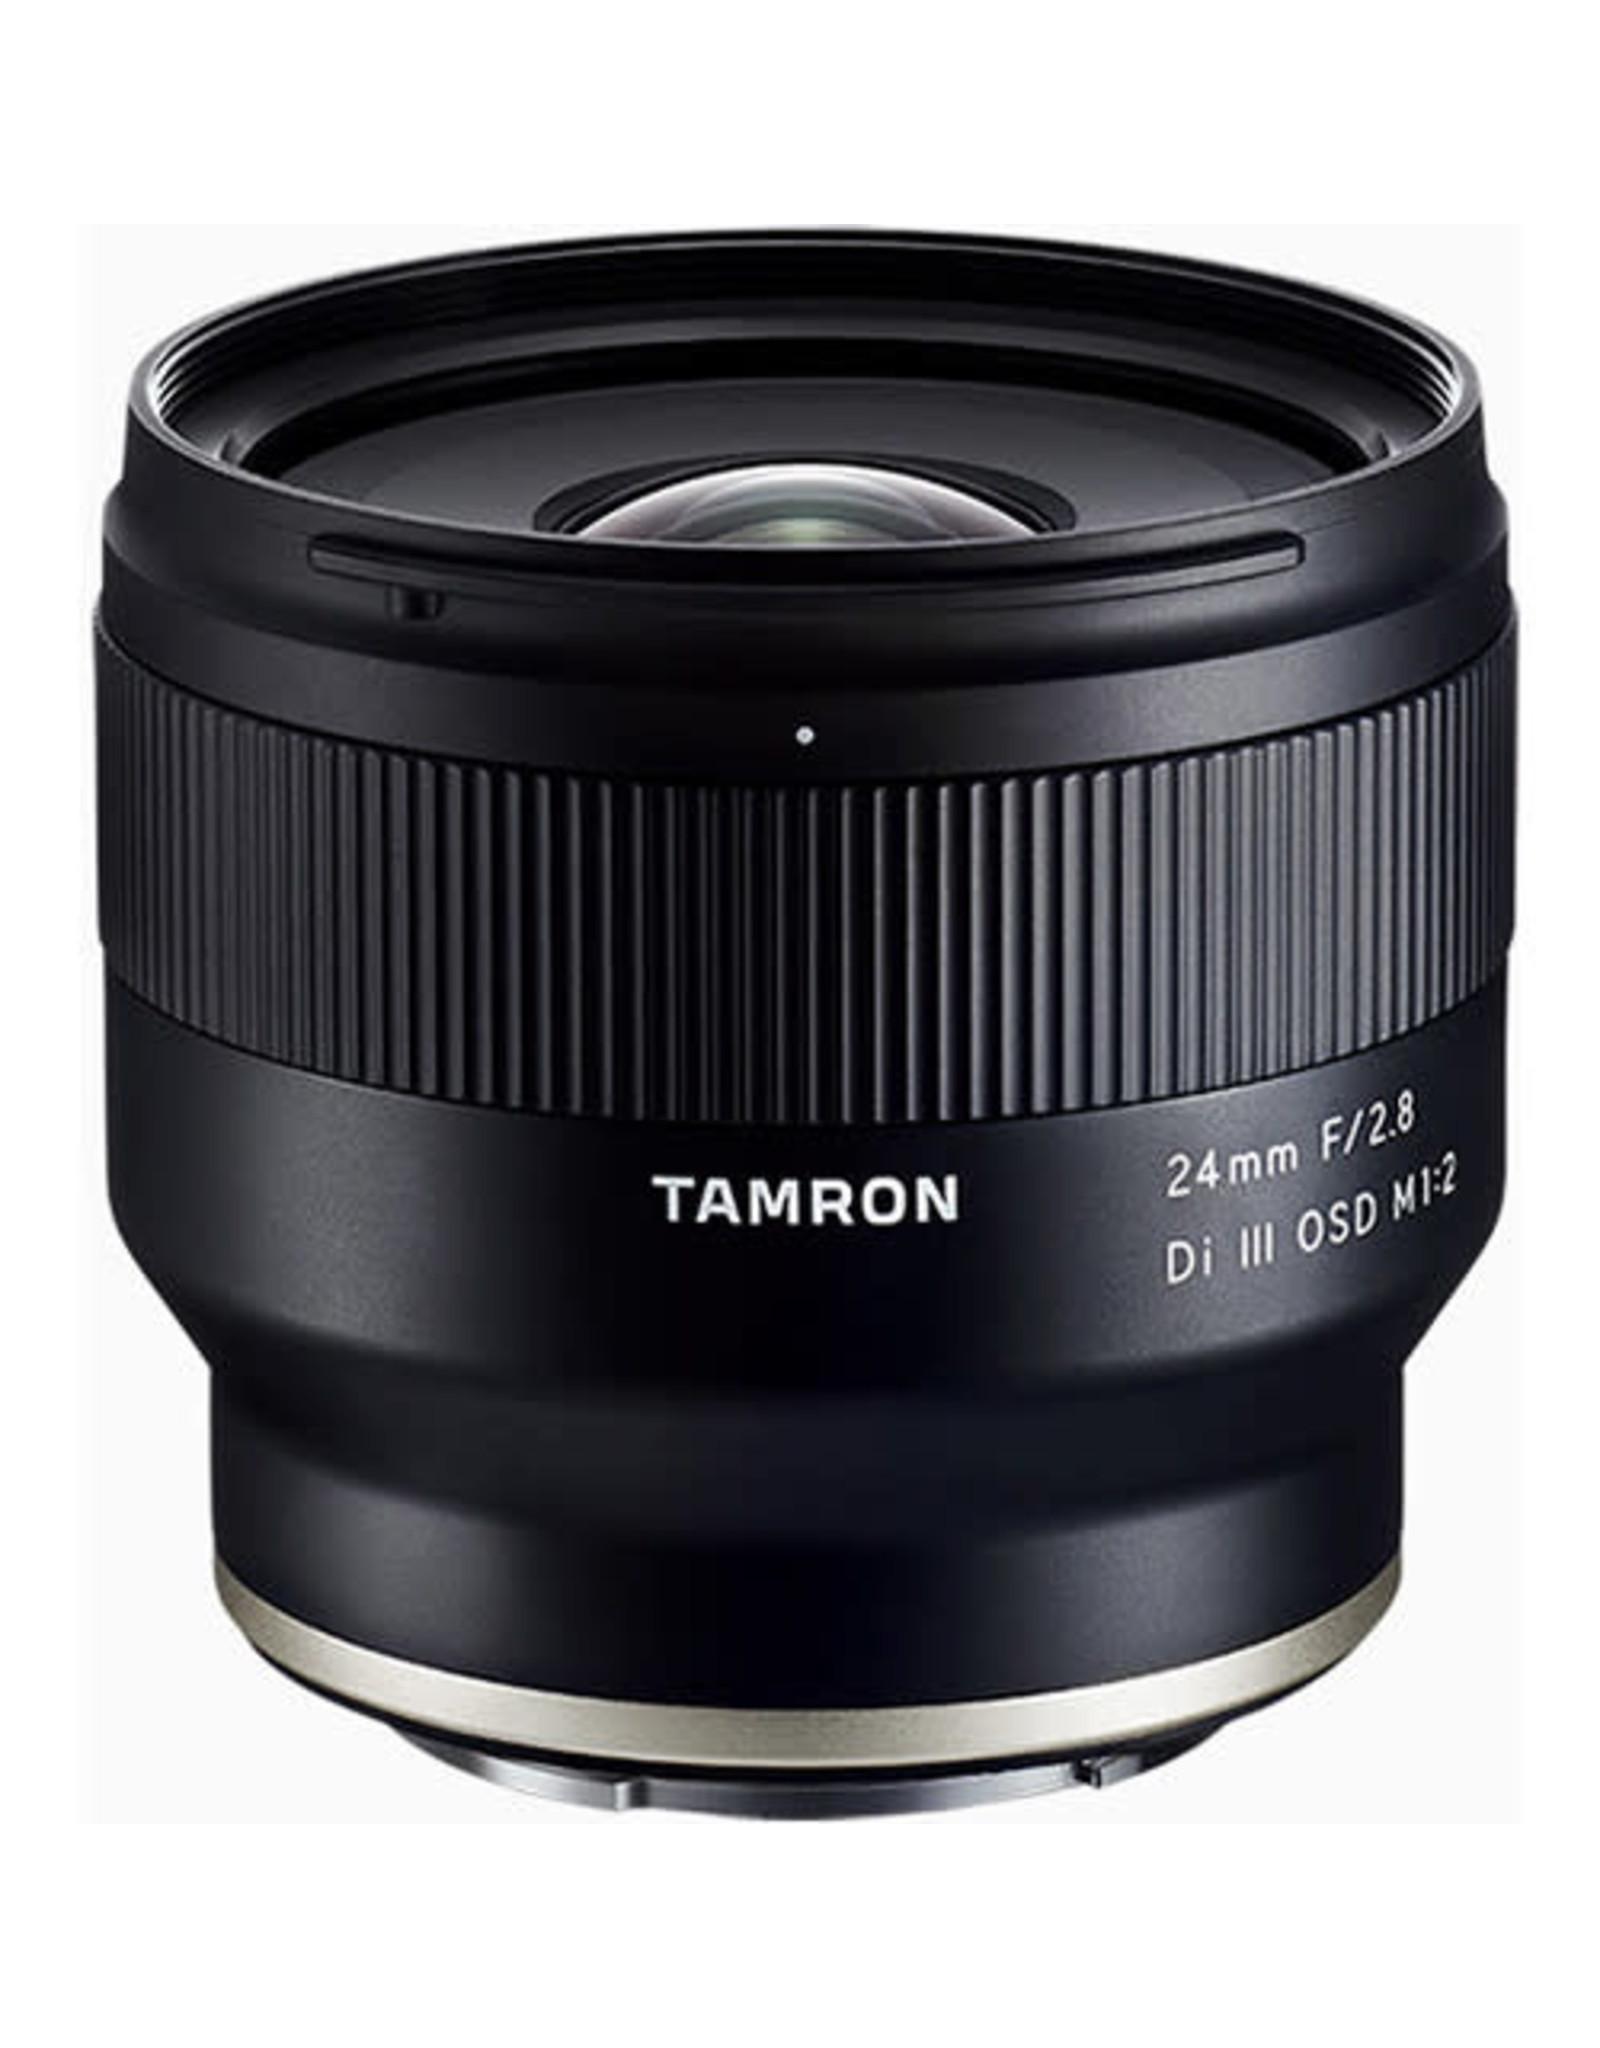 Tamron Tamron 24mm f/2.8 Di III OSD M 1:2 Lens for Sony E